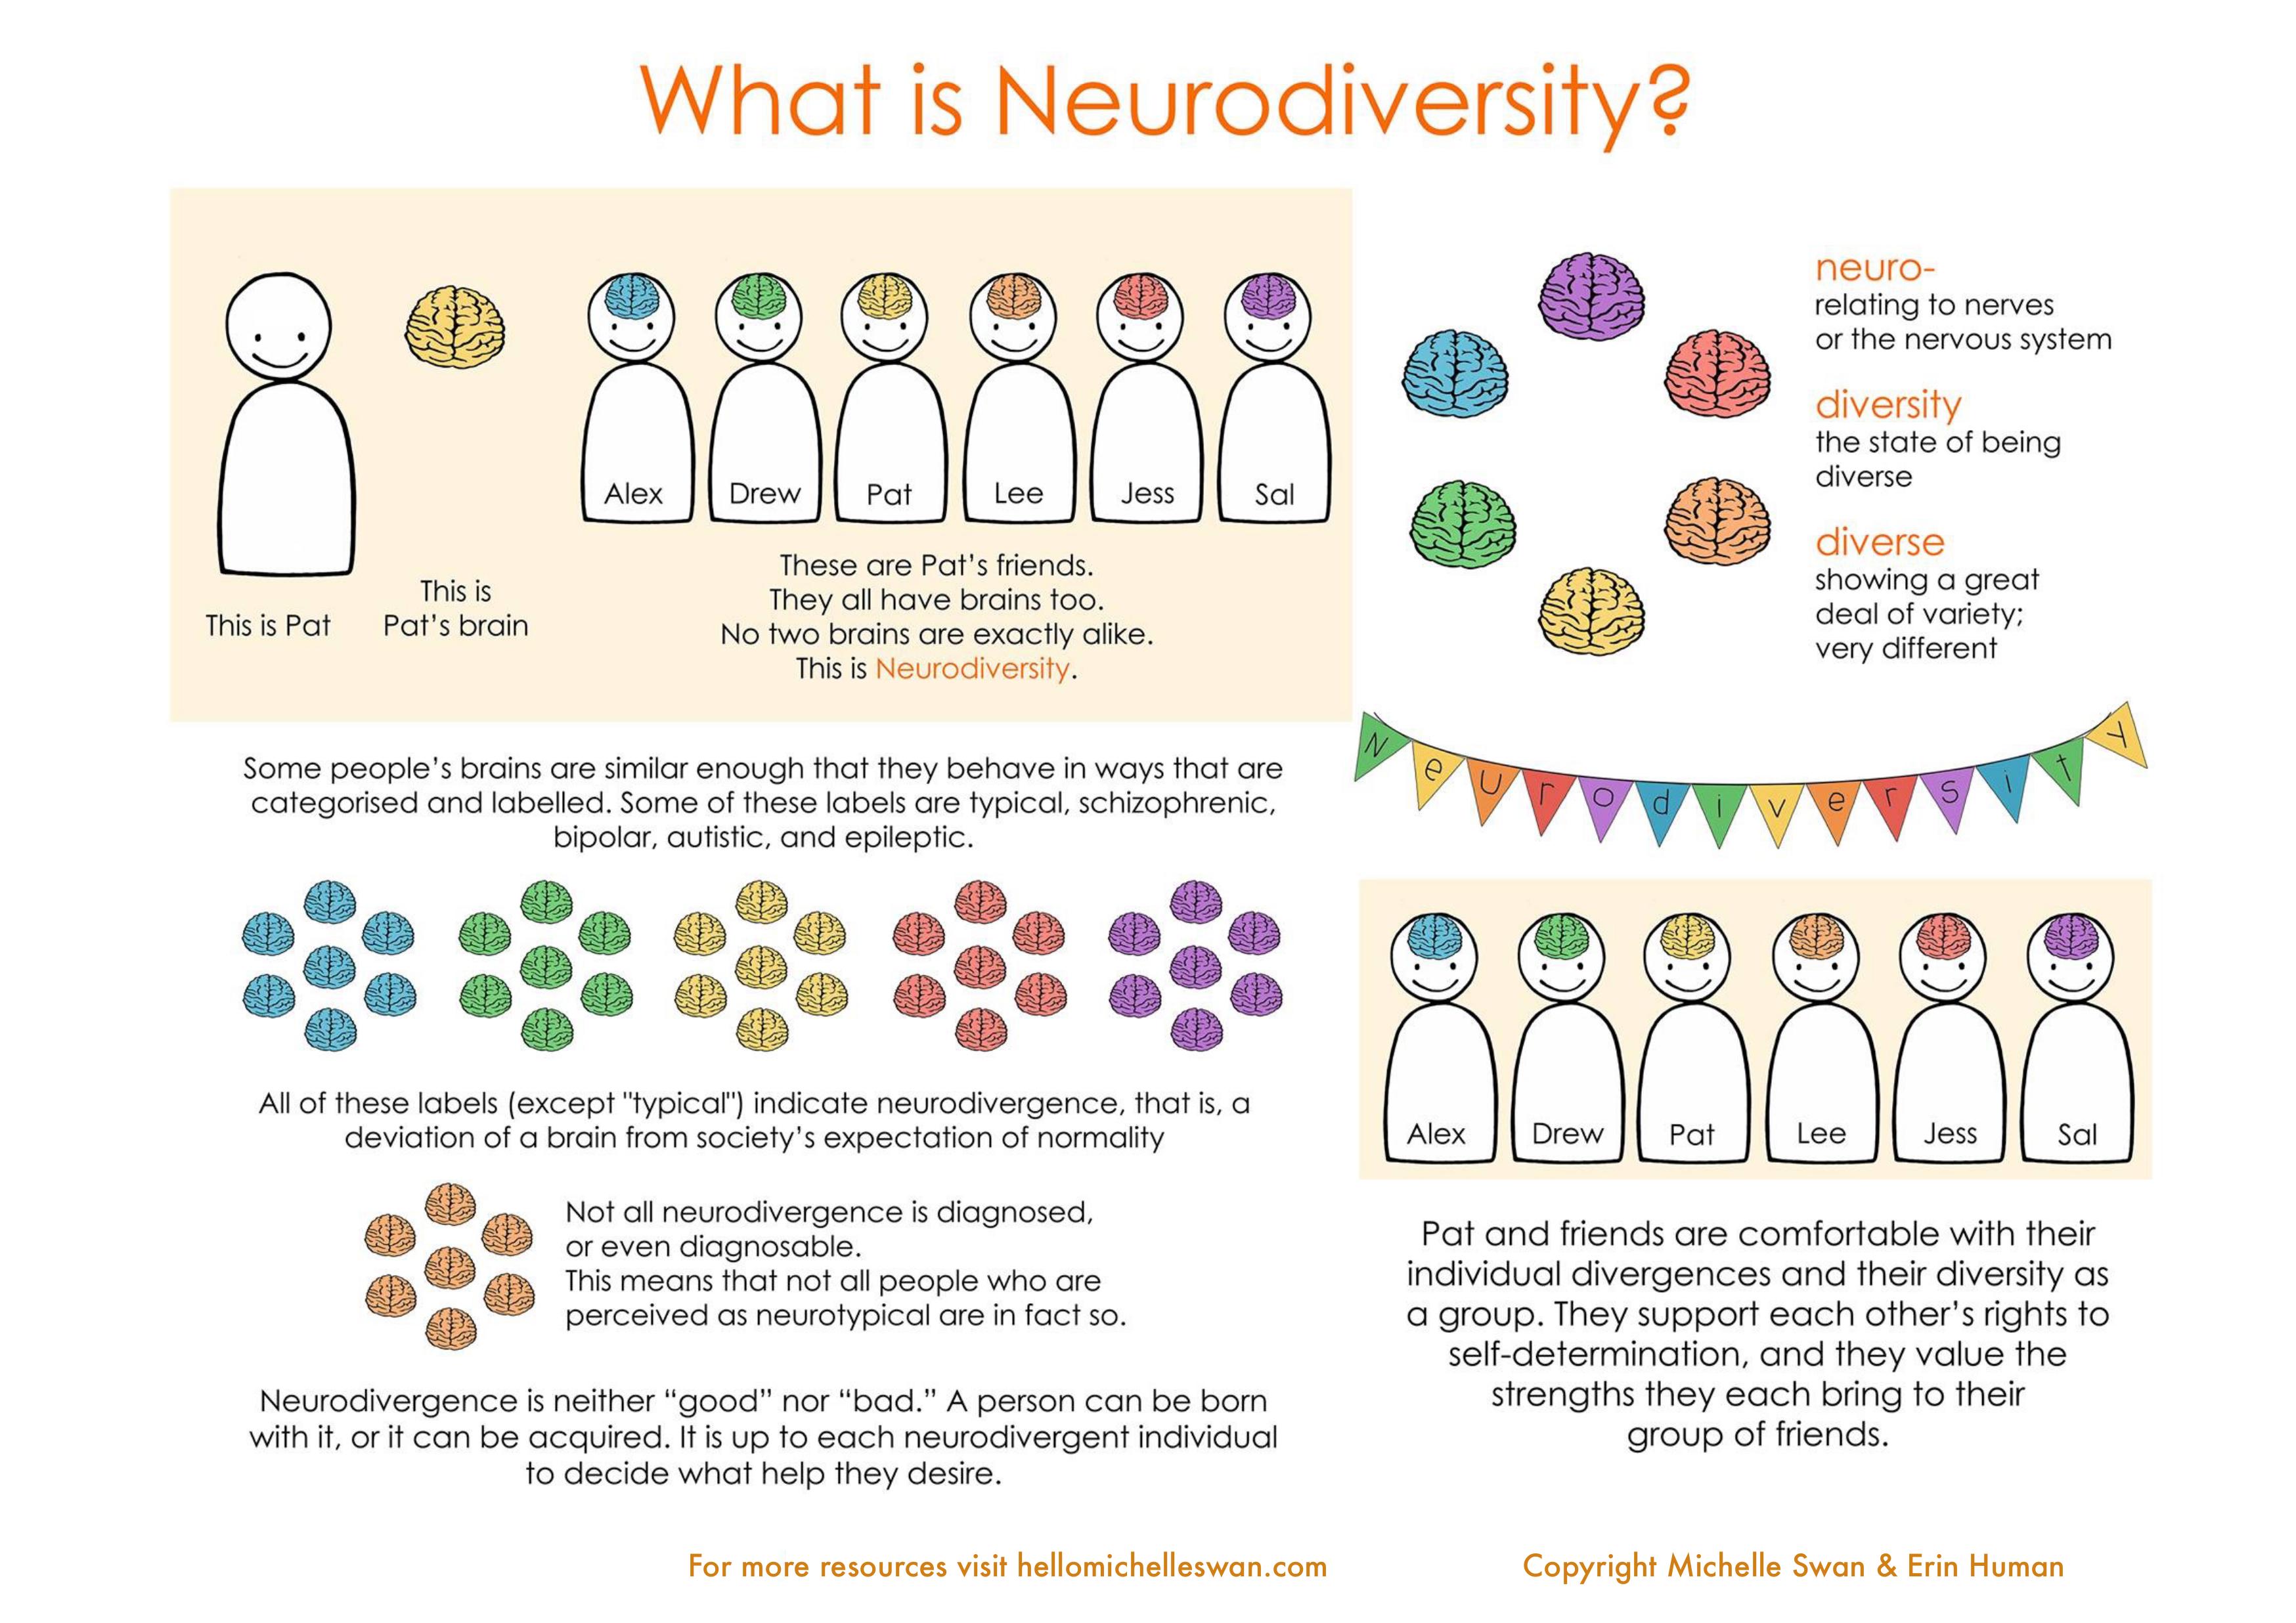 What is Neurodiversity? · Hello Michelle Swan